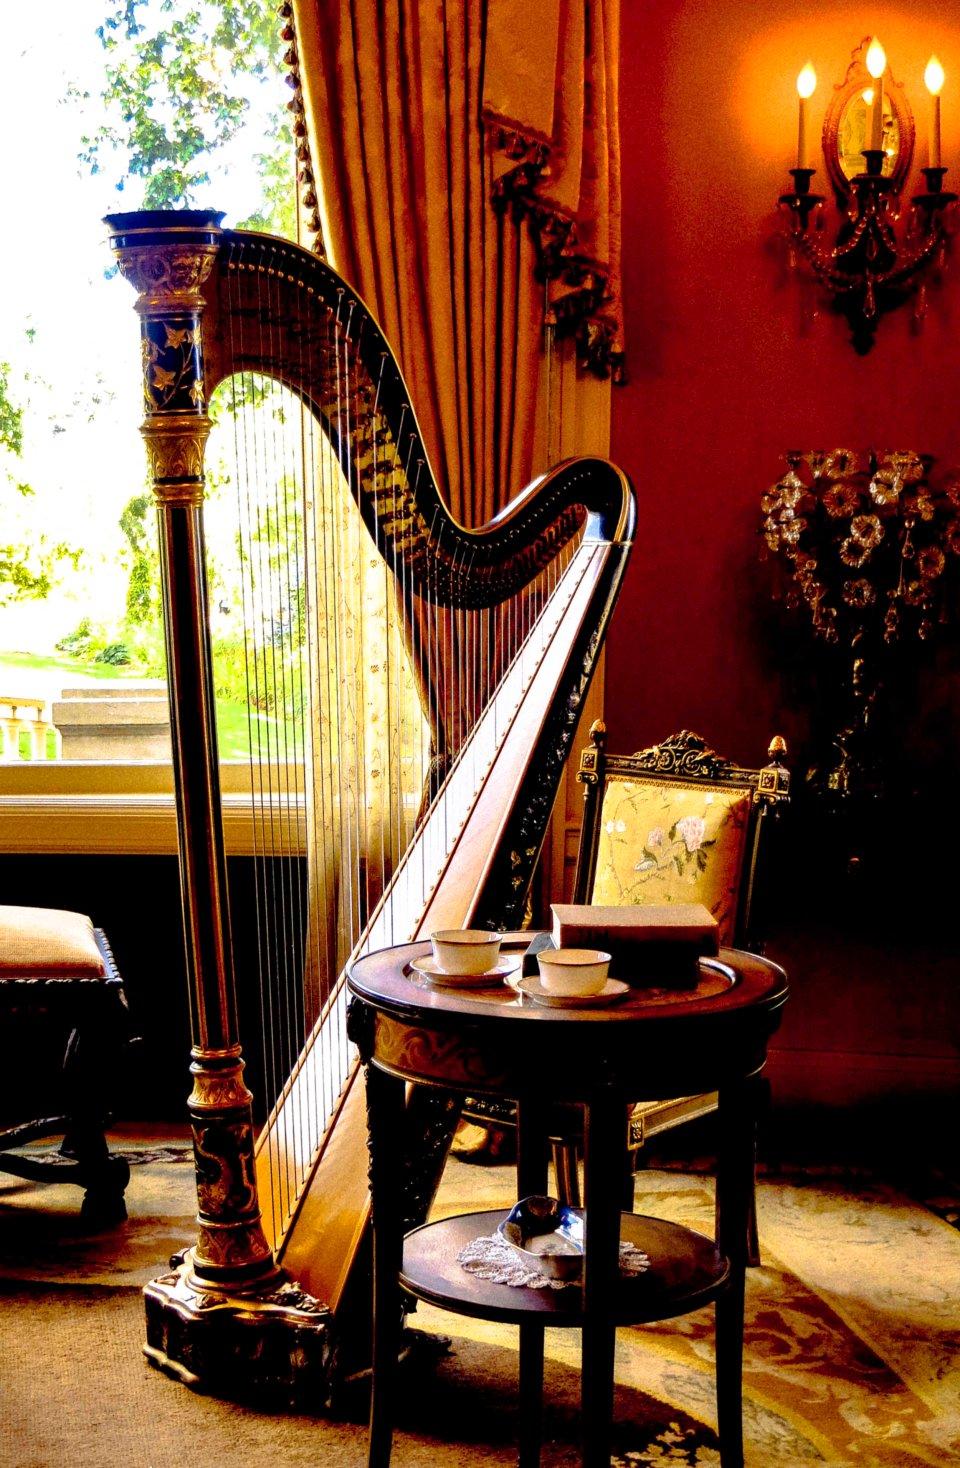 Harp, PittcockM FLW 5775